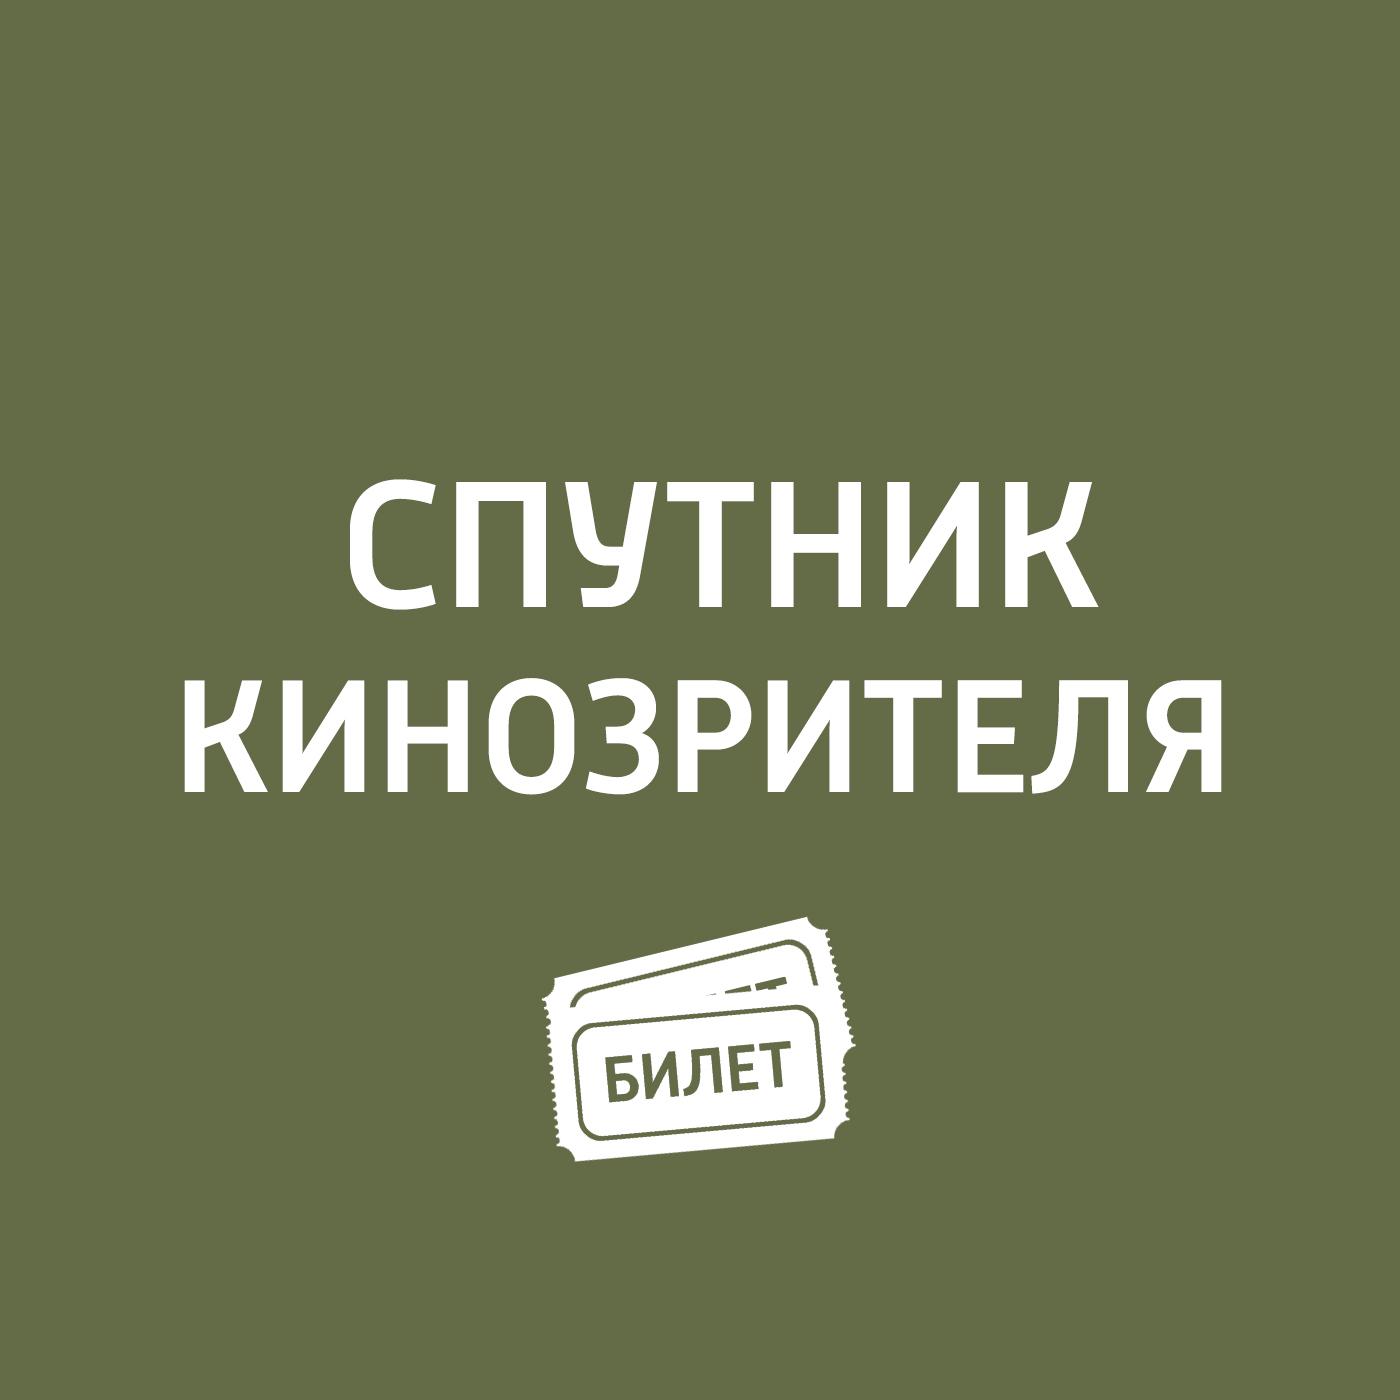 Антон Долин «Субурбикон»; «Лига справедливости»; «Молодой Годар»; «Мифы» андрей годар под тенью феникса